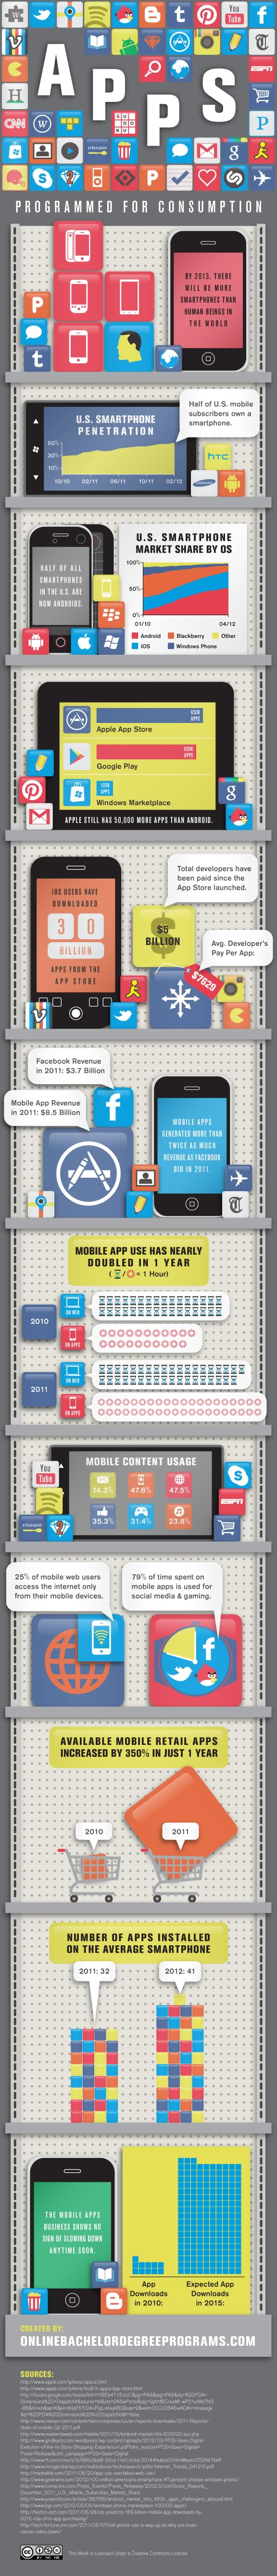 89% de las apps descargadas en teléfonos celulares son gratis - apps-programmed-for-consumption